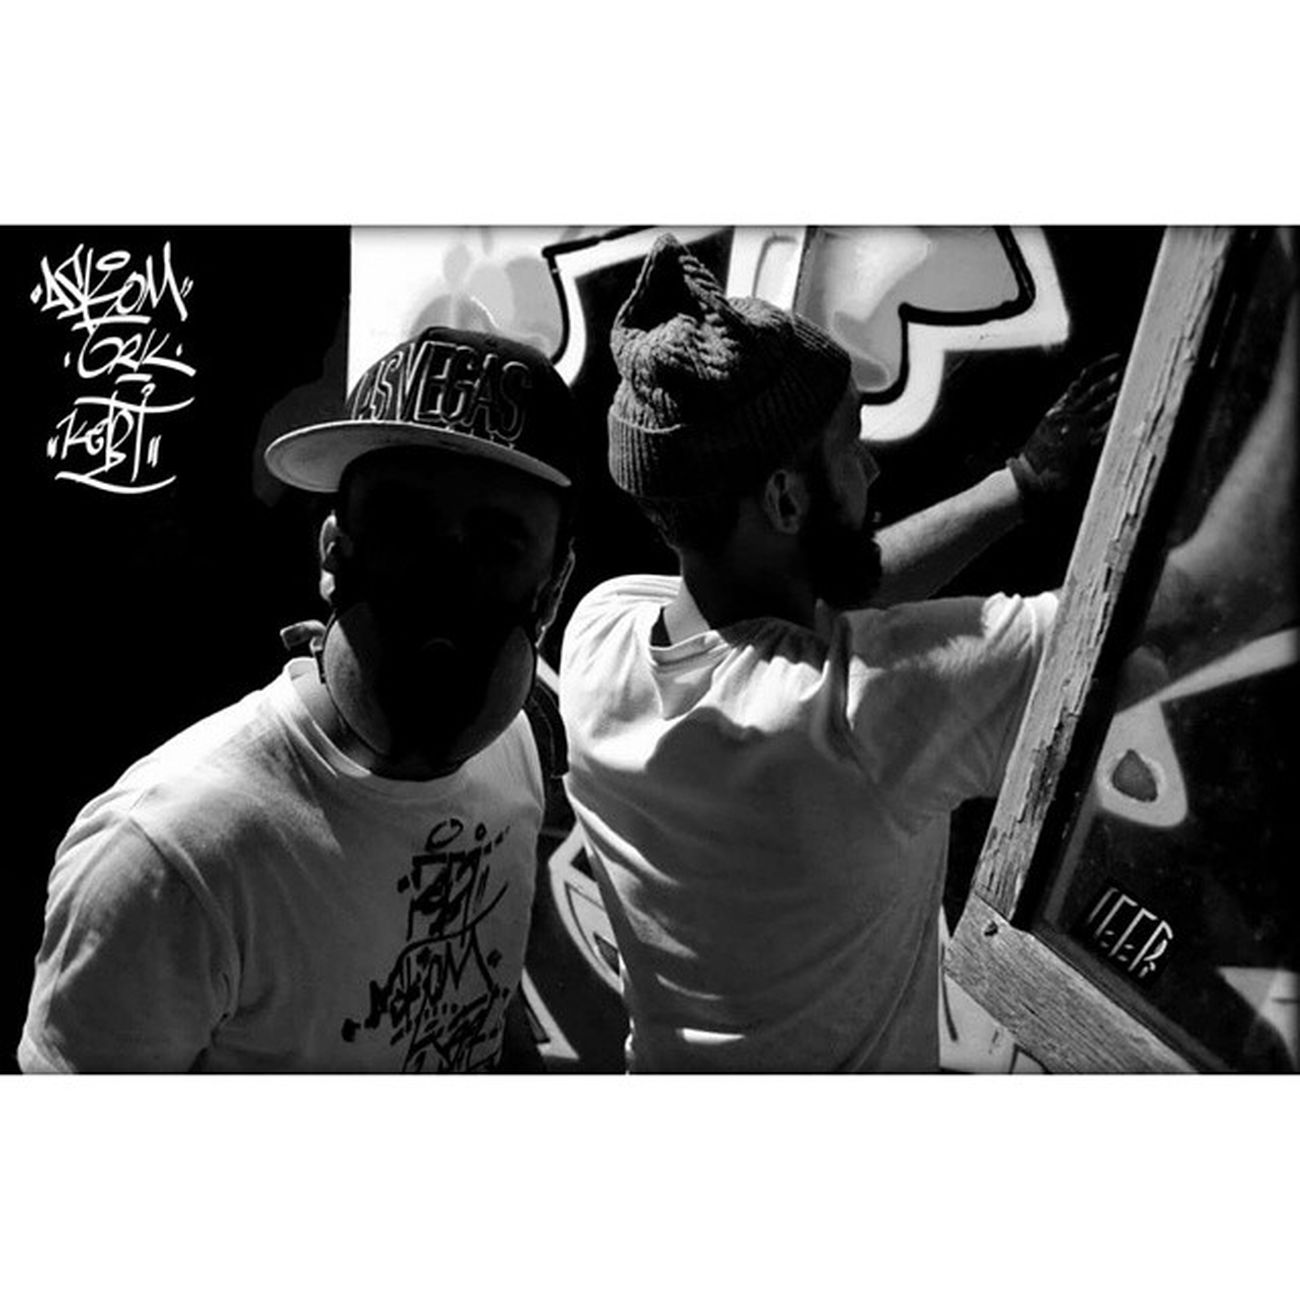 GOLD RUSH KINGZ. 👥 KEBI/ASKOM. Grkcrew Grkingz GRK Goldrushkingz Graffitiart Graffiti Graffitiwall Vandal